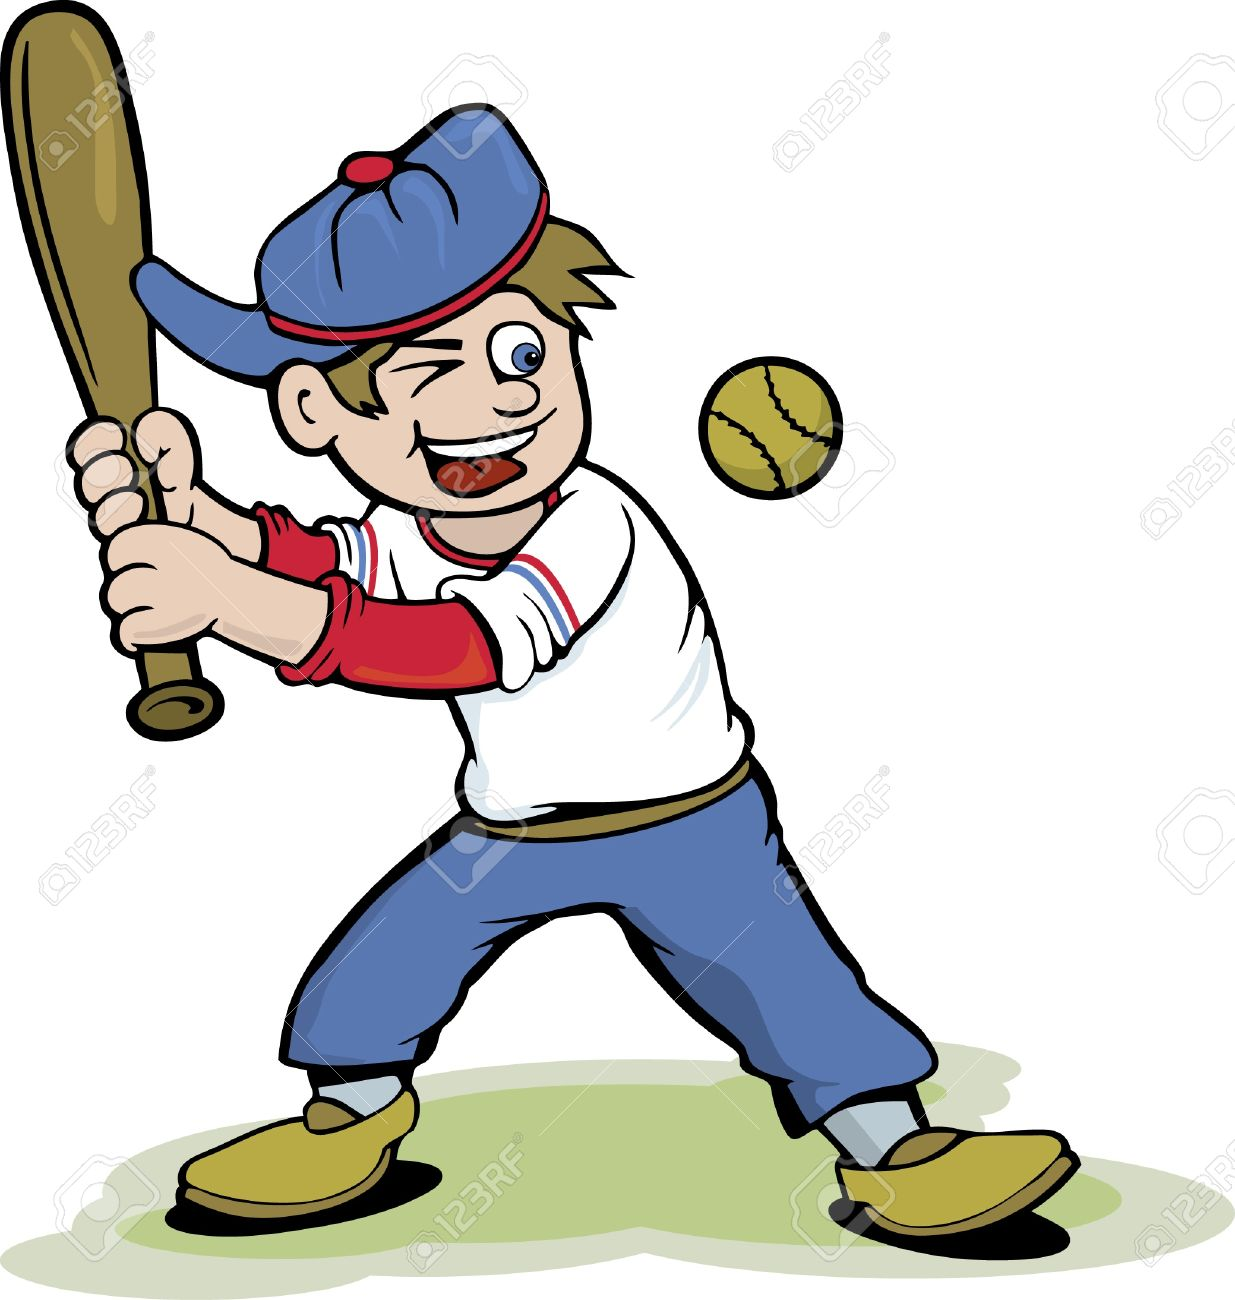 baseball kid cartoon royalty free cliparts vectors and stock rh 123rf com Baseball Silhouette Vector Baseball Laces Vector